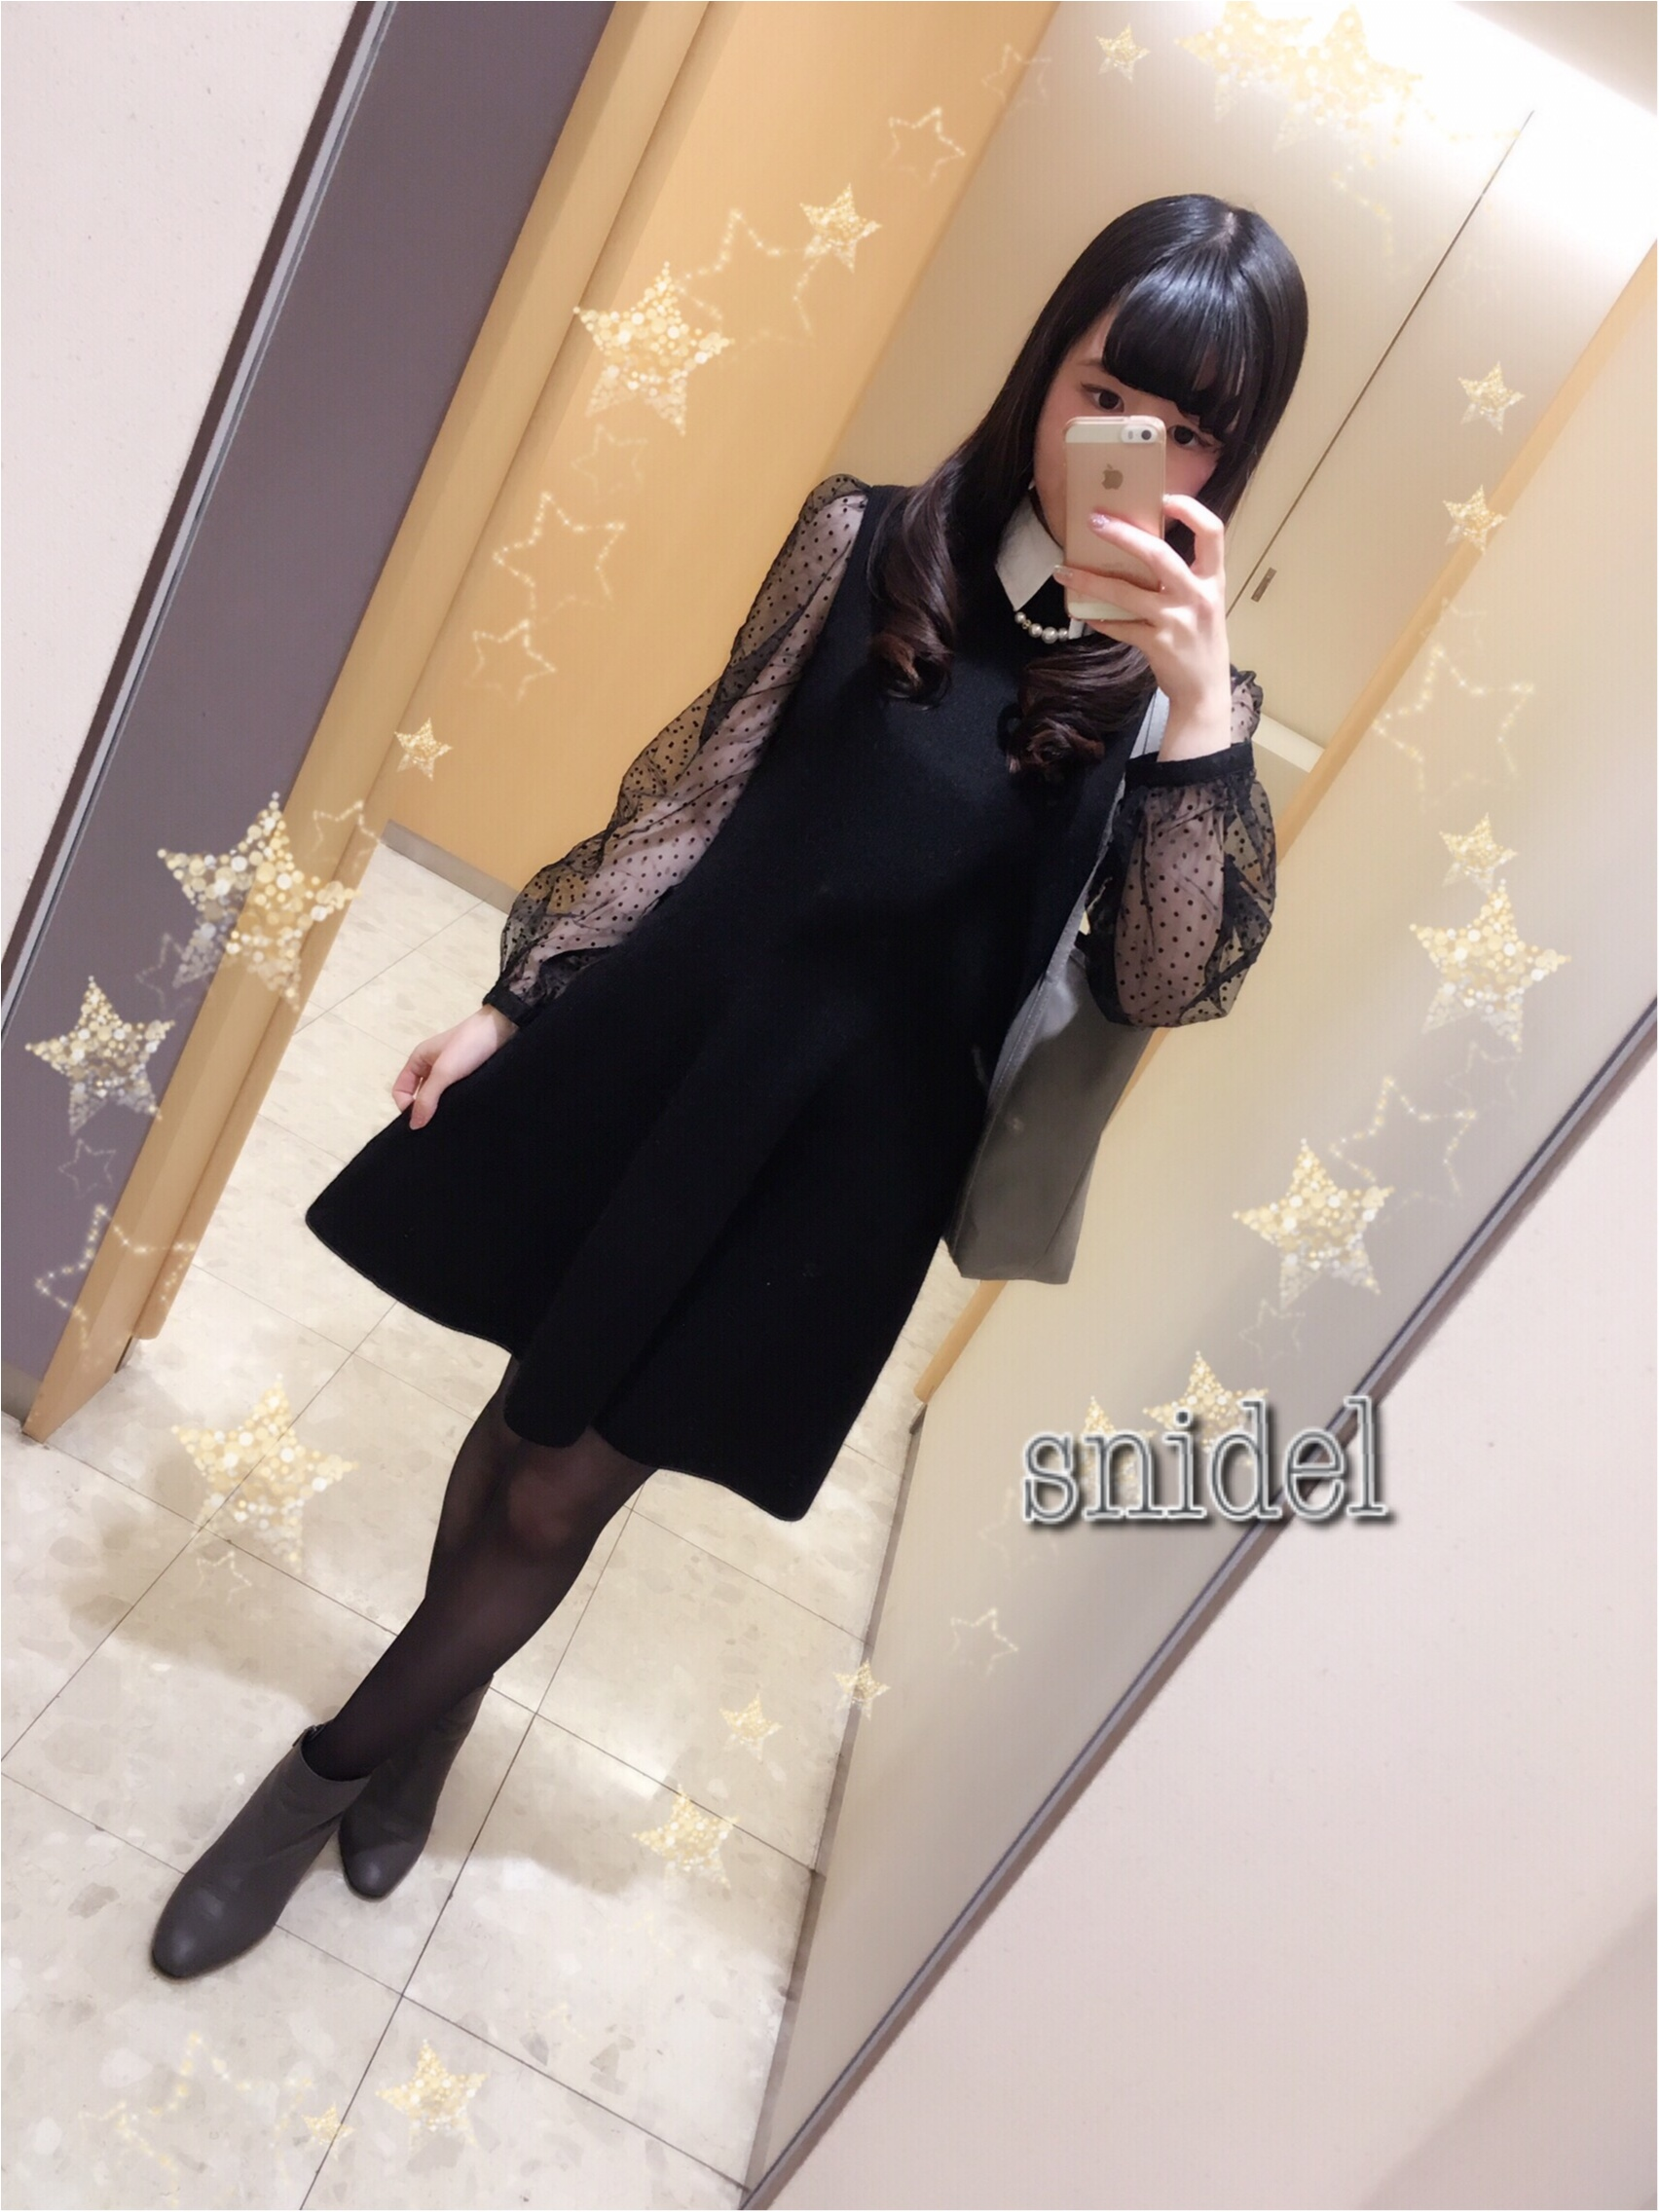 【snidel】りぃコーデ♡第1弾♡家族とshopping ver._1